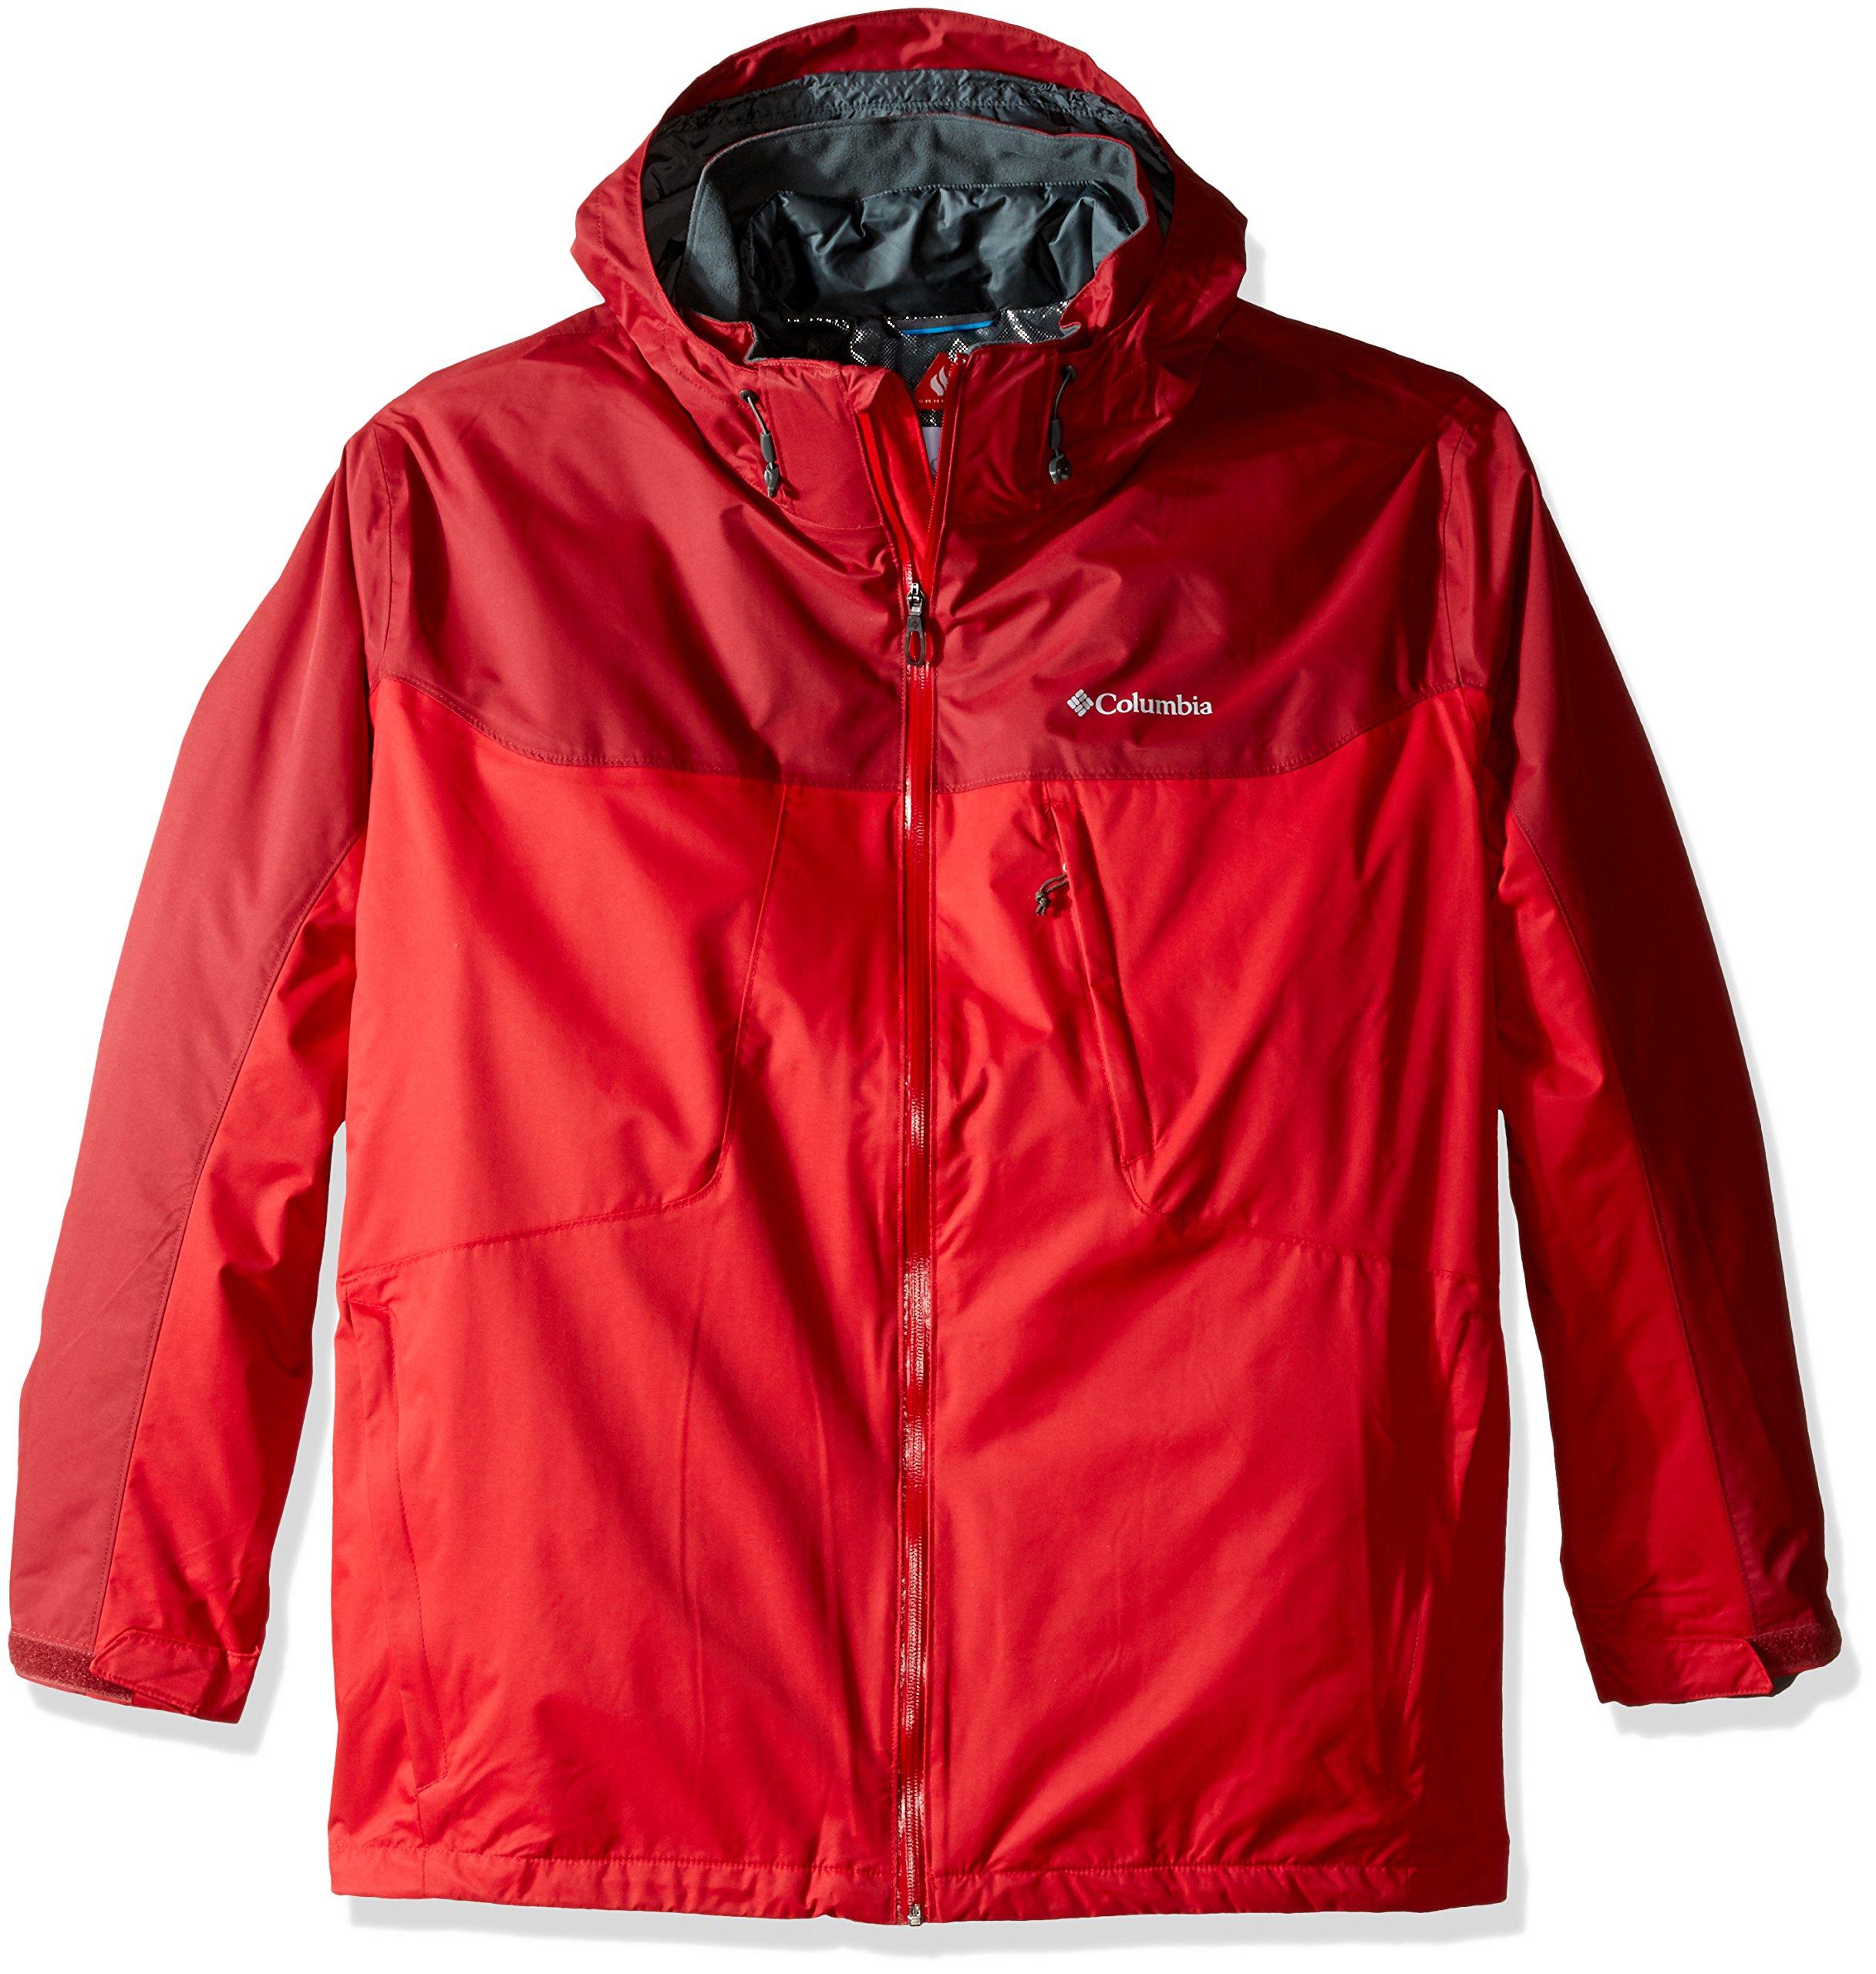 Columbia Men's Whirlibird Interchange Jacket, Mountain Red/Jester Red, 4X